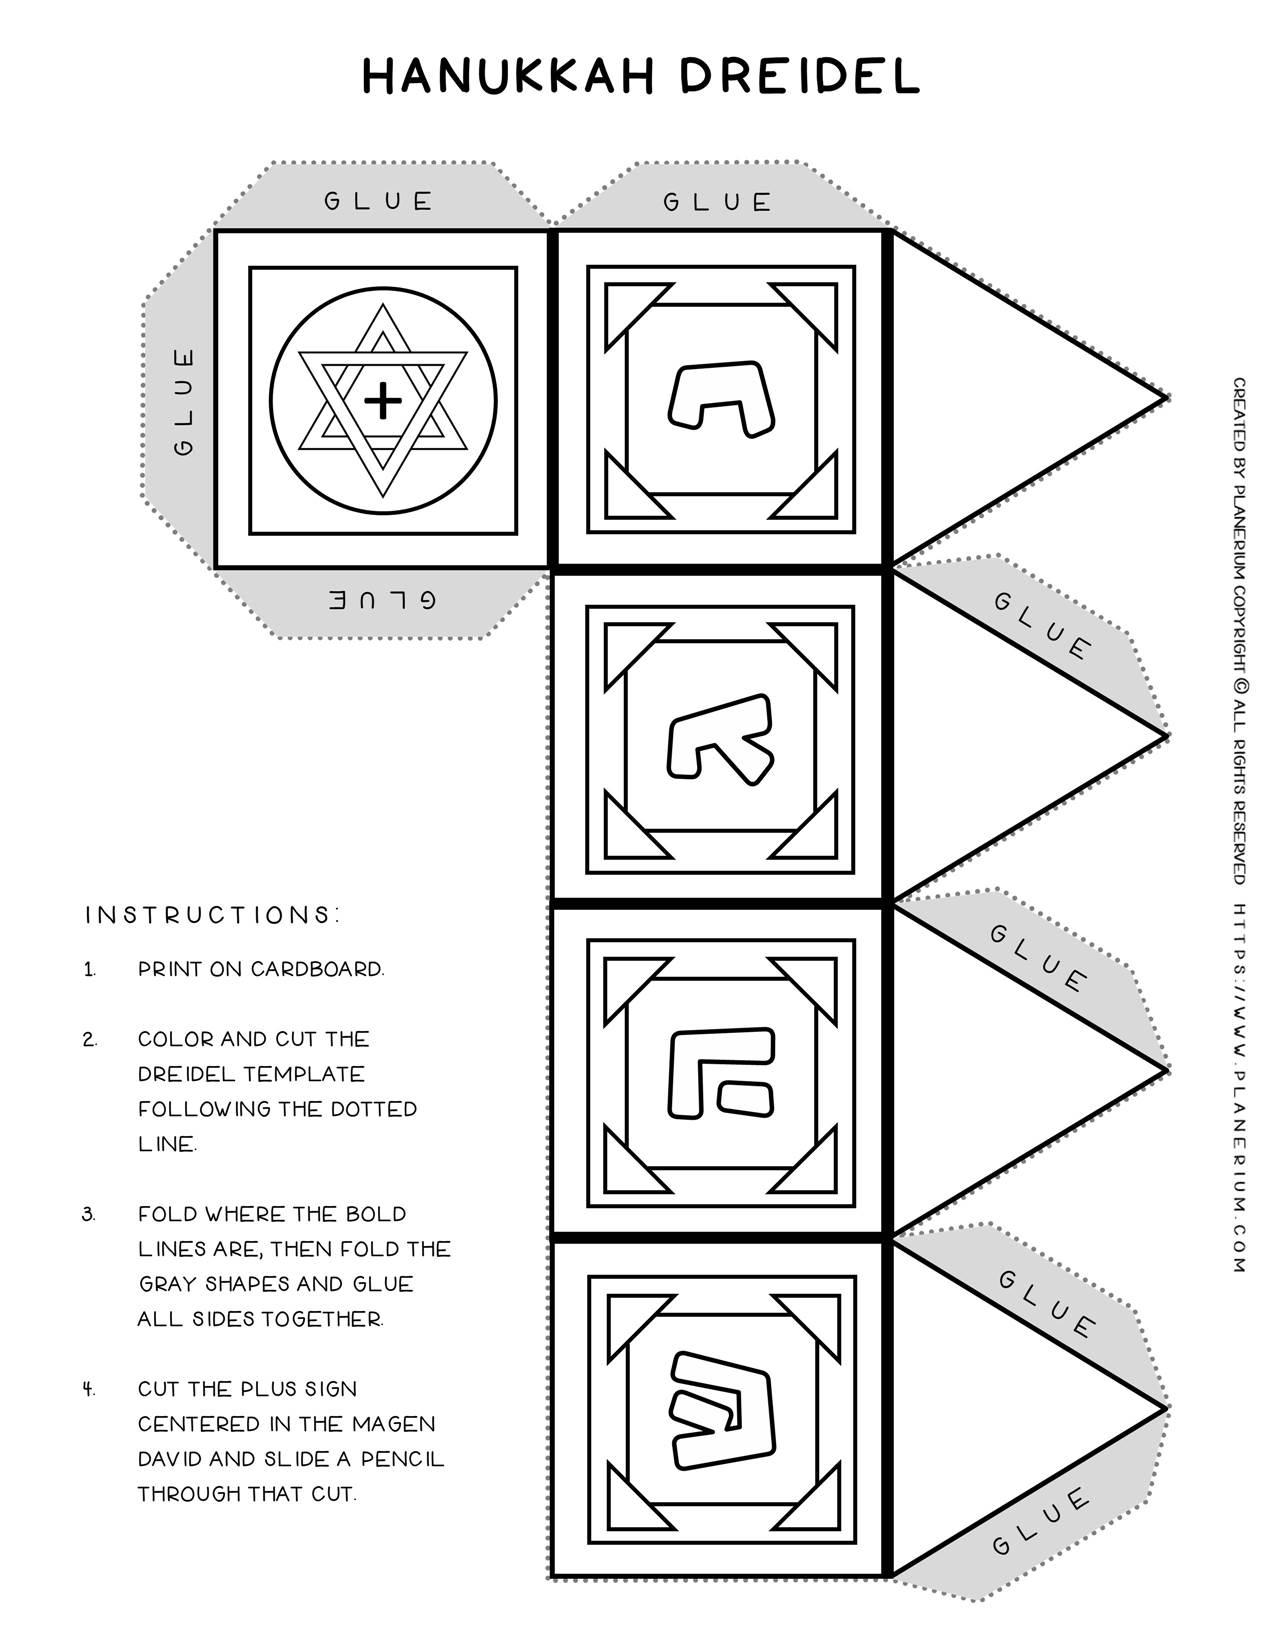 Dreidel Template - How to make a dreidel with the letter Shin - Hanukkah Worksheet | Planerium